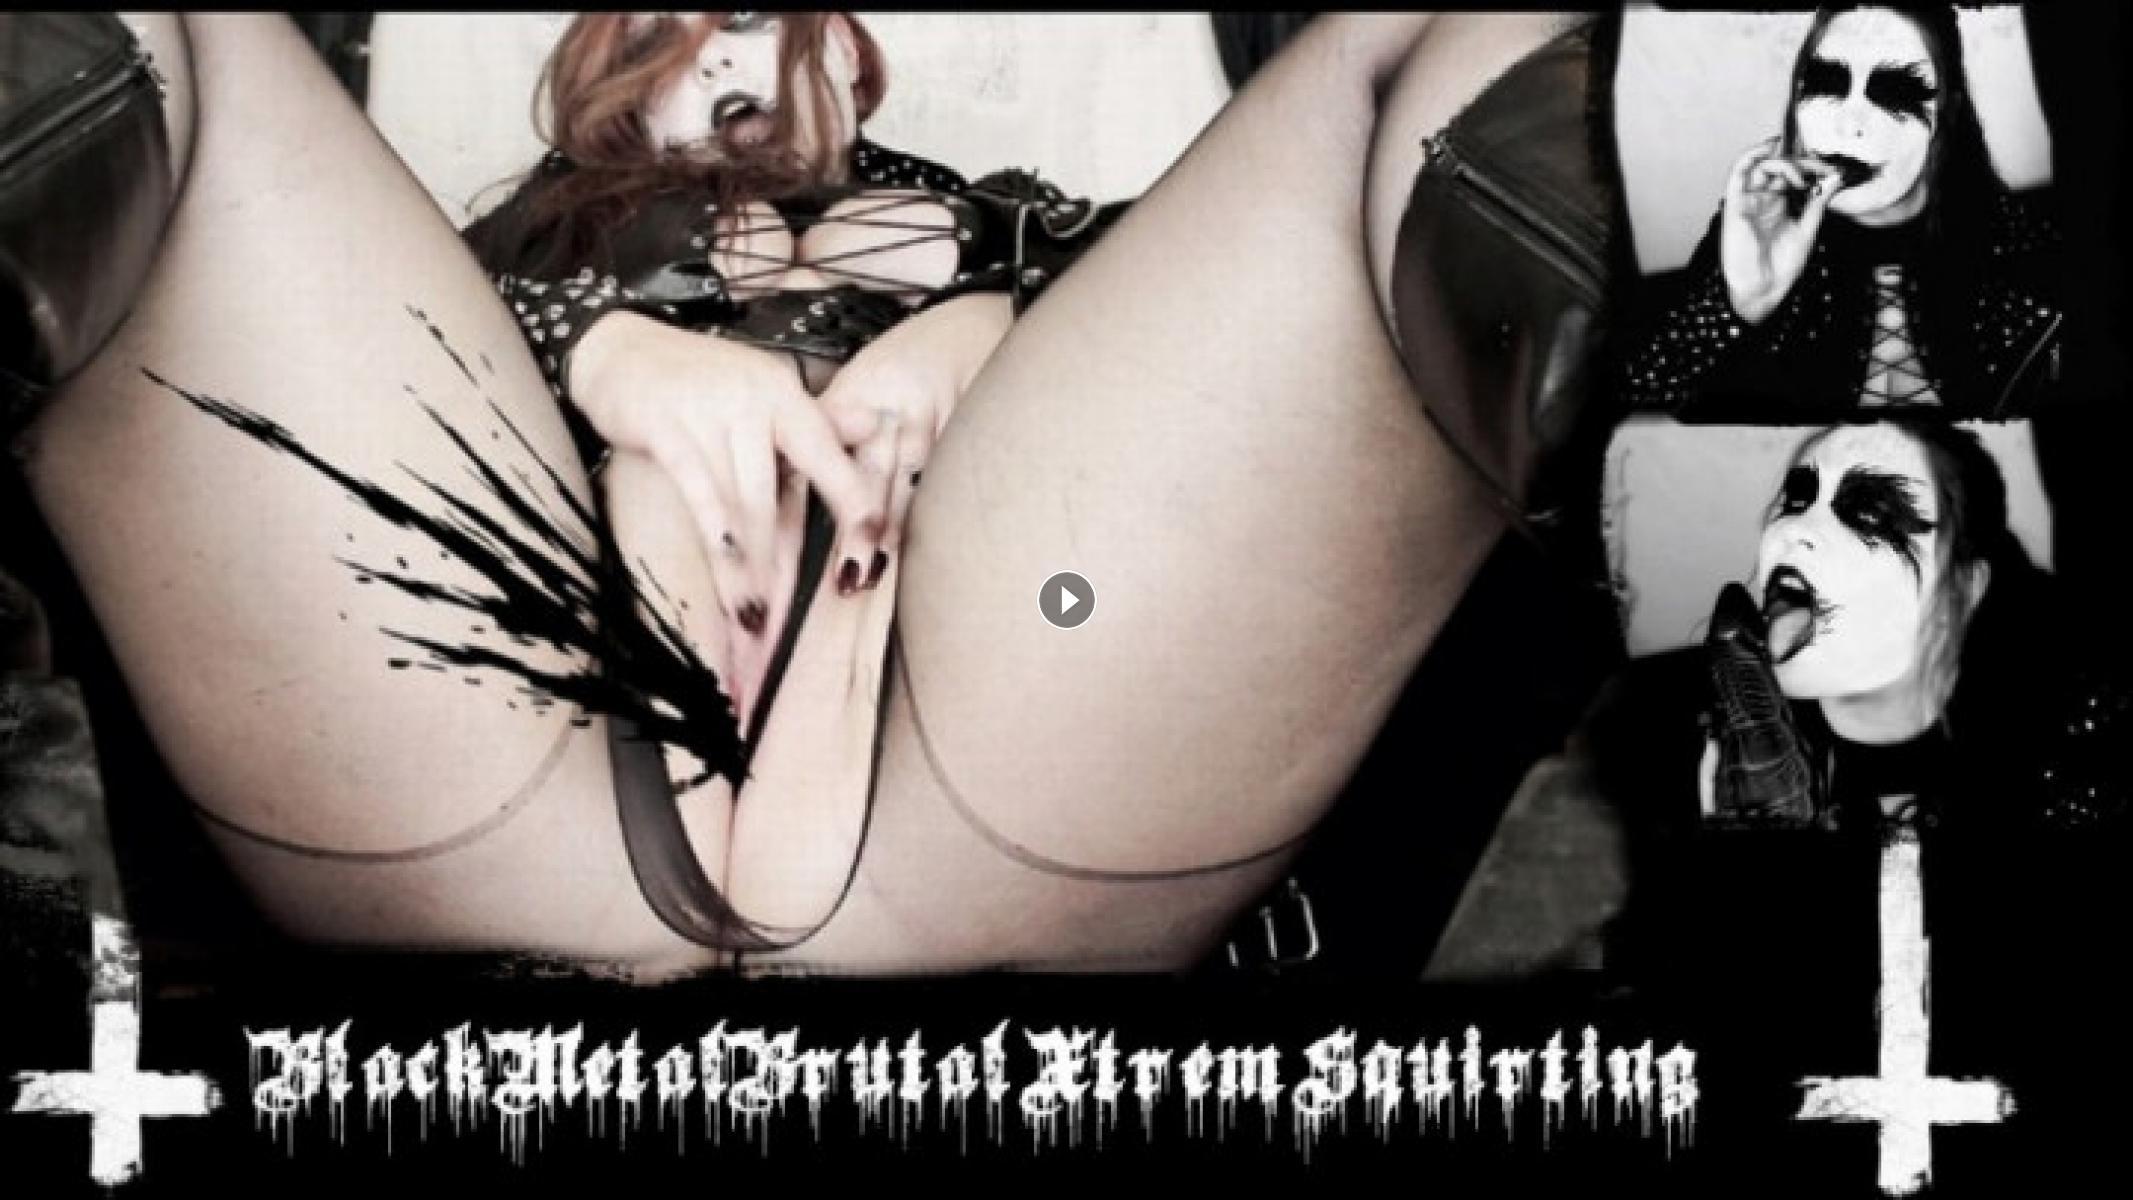 porn-black-metal-joan-cusack-young-nude